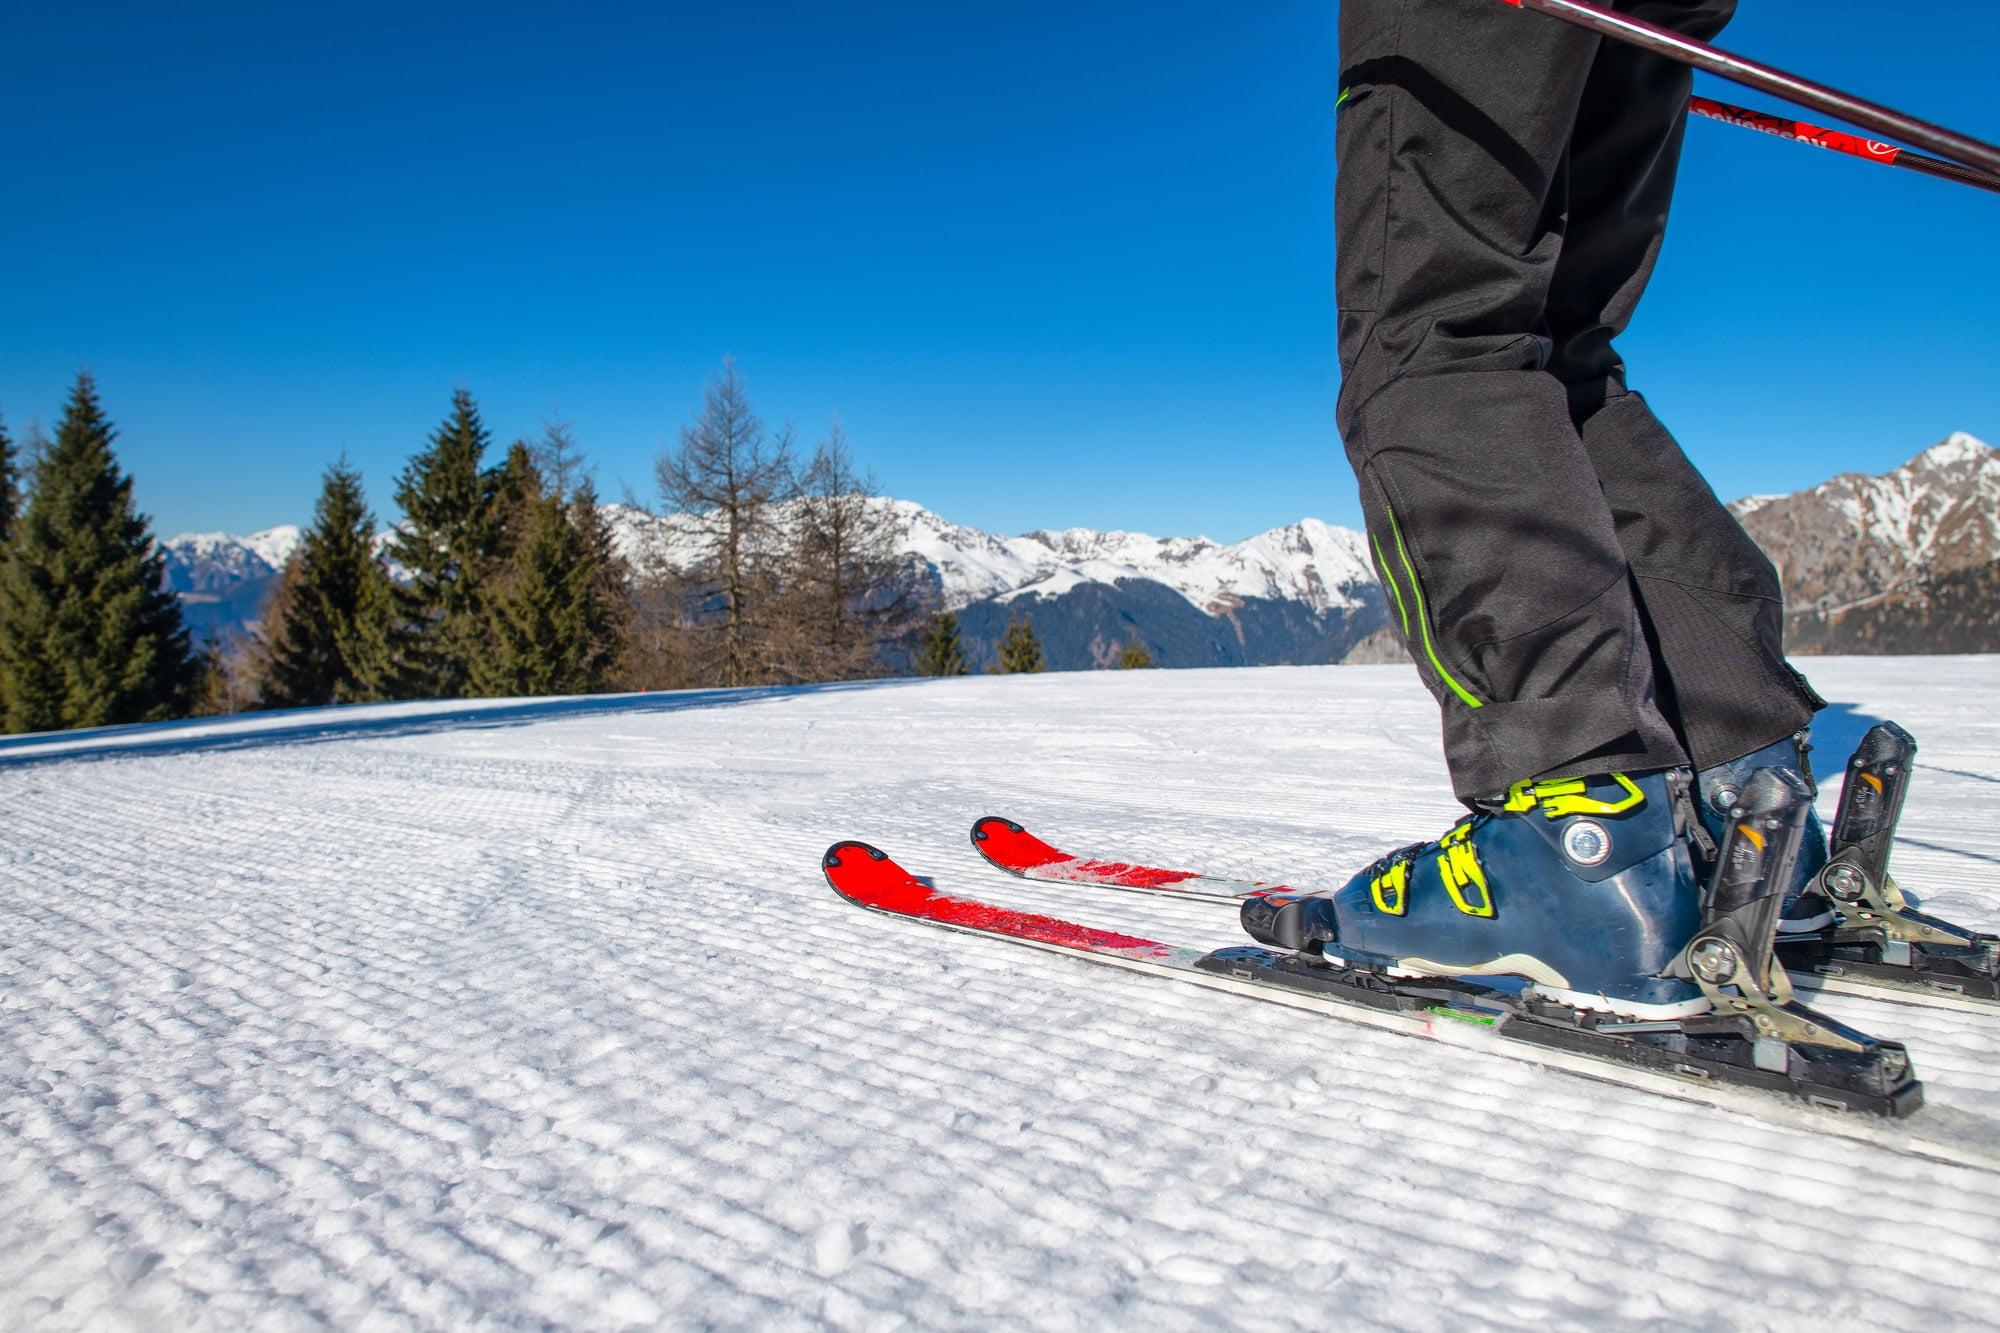 Ski detail on ski